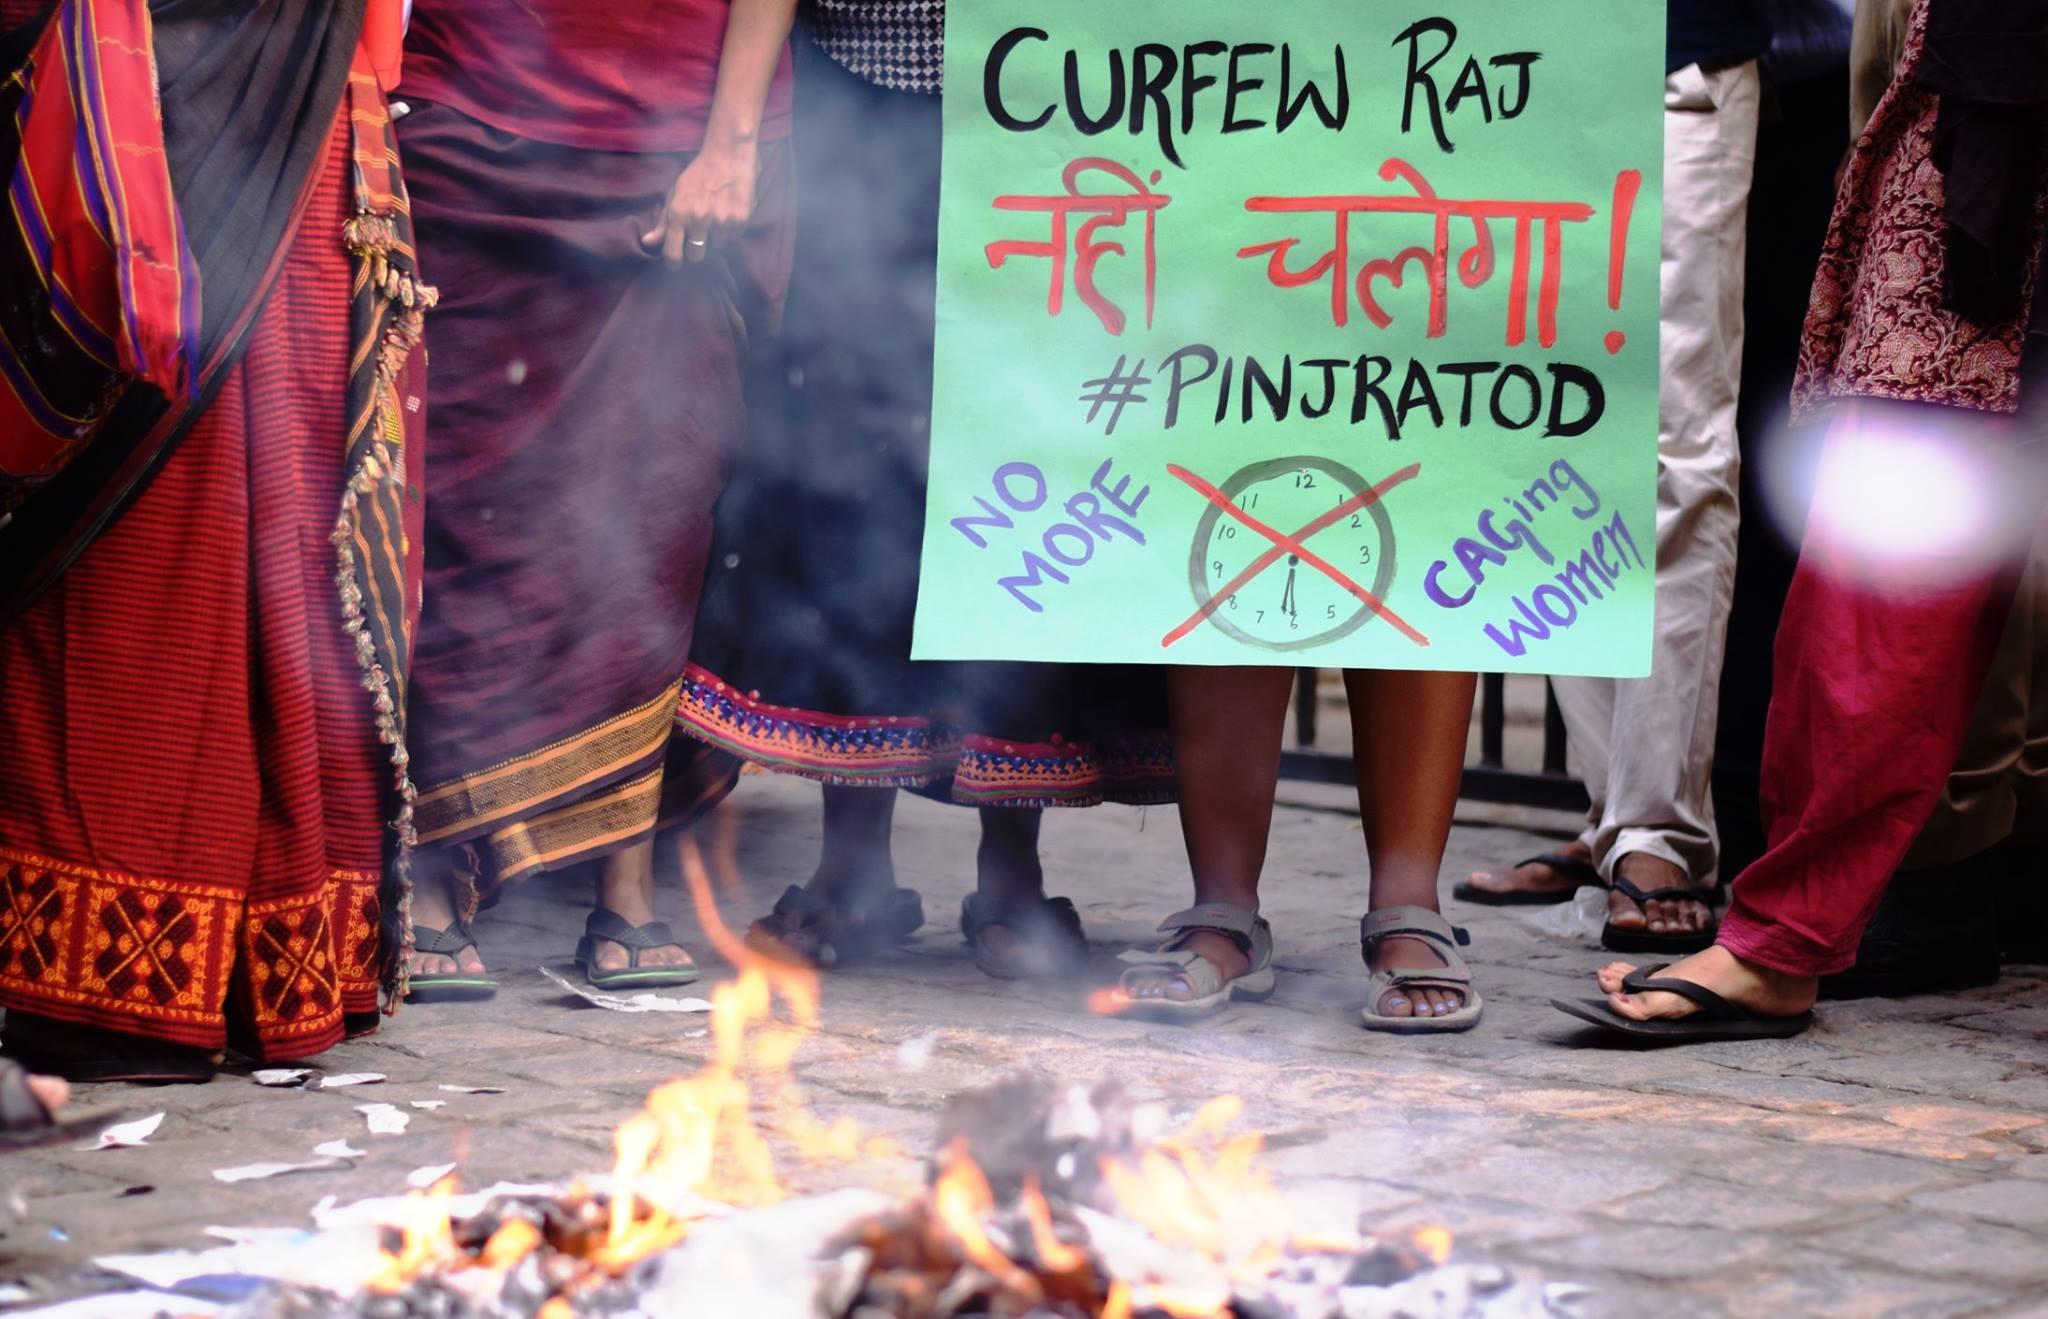 pinjra tod no more curfew raj